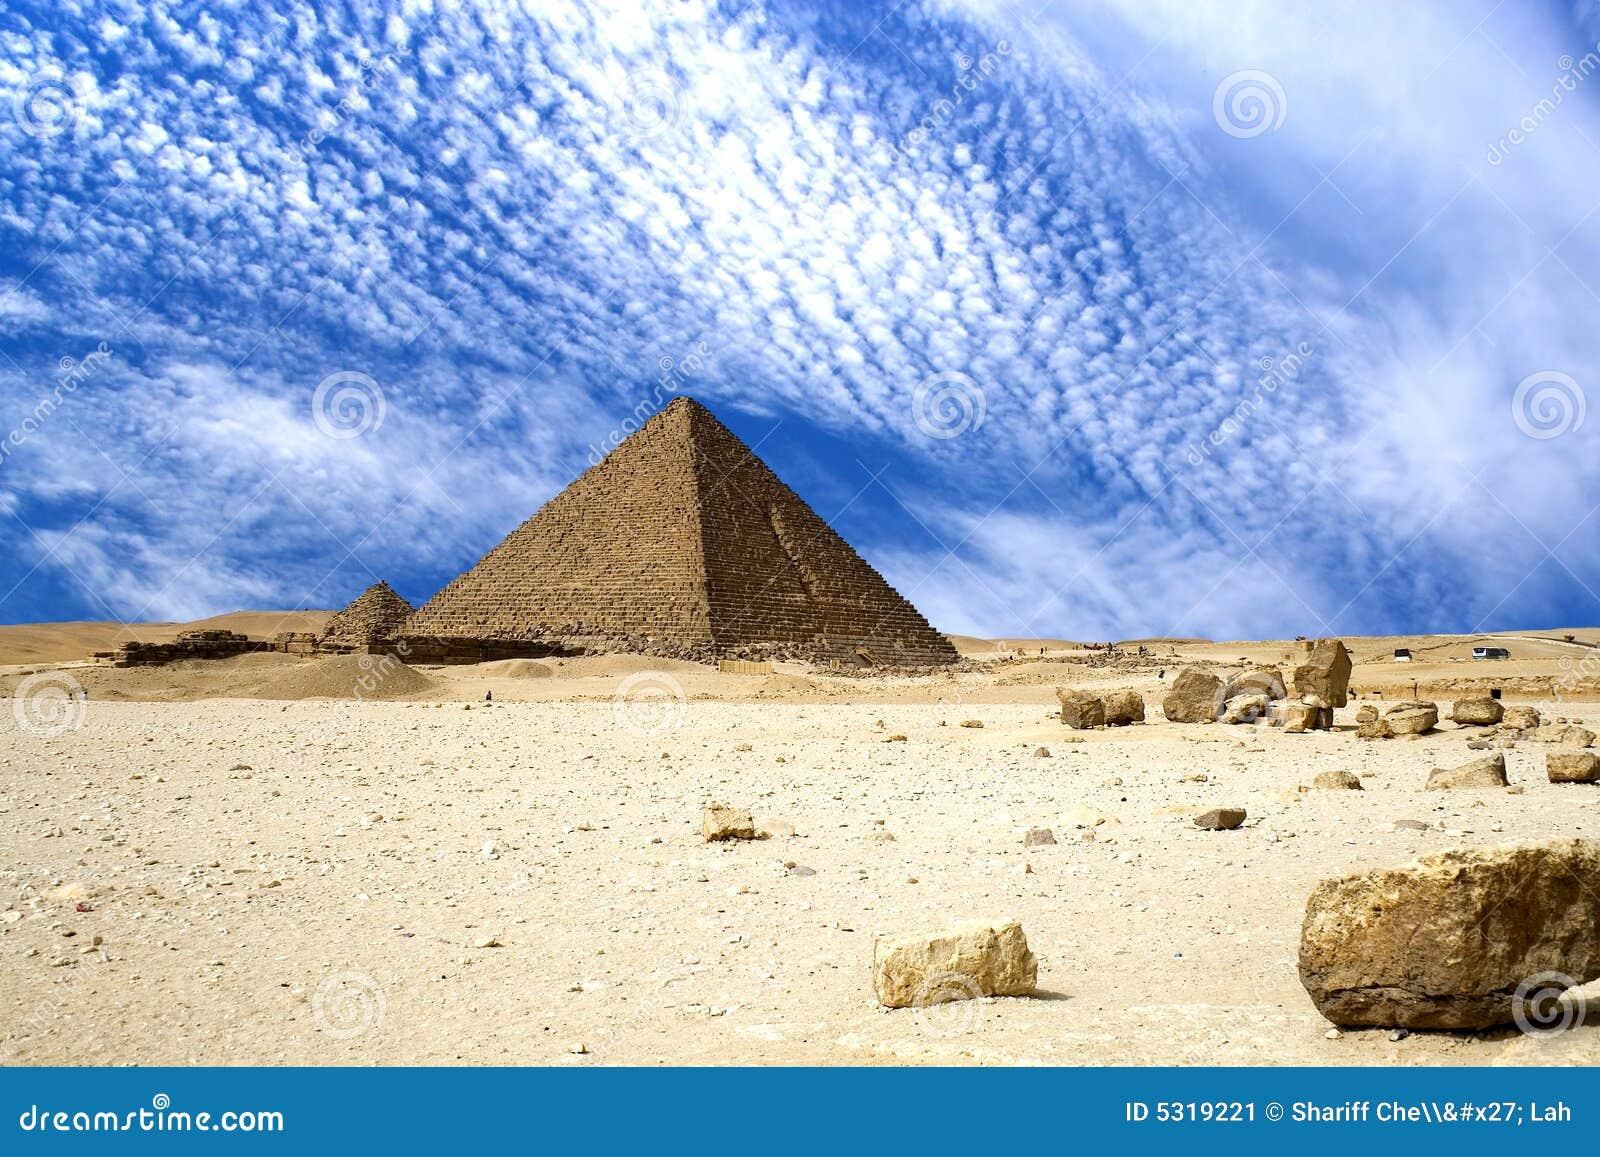 Download Grandi piramidi egiziane immagine stock. Immagine di archaeology - 5319221